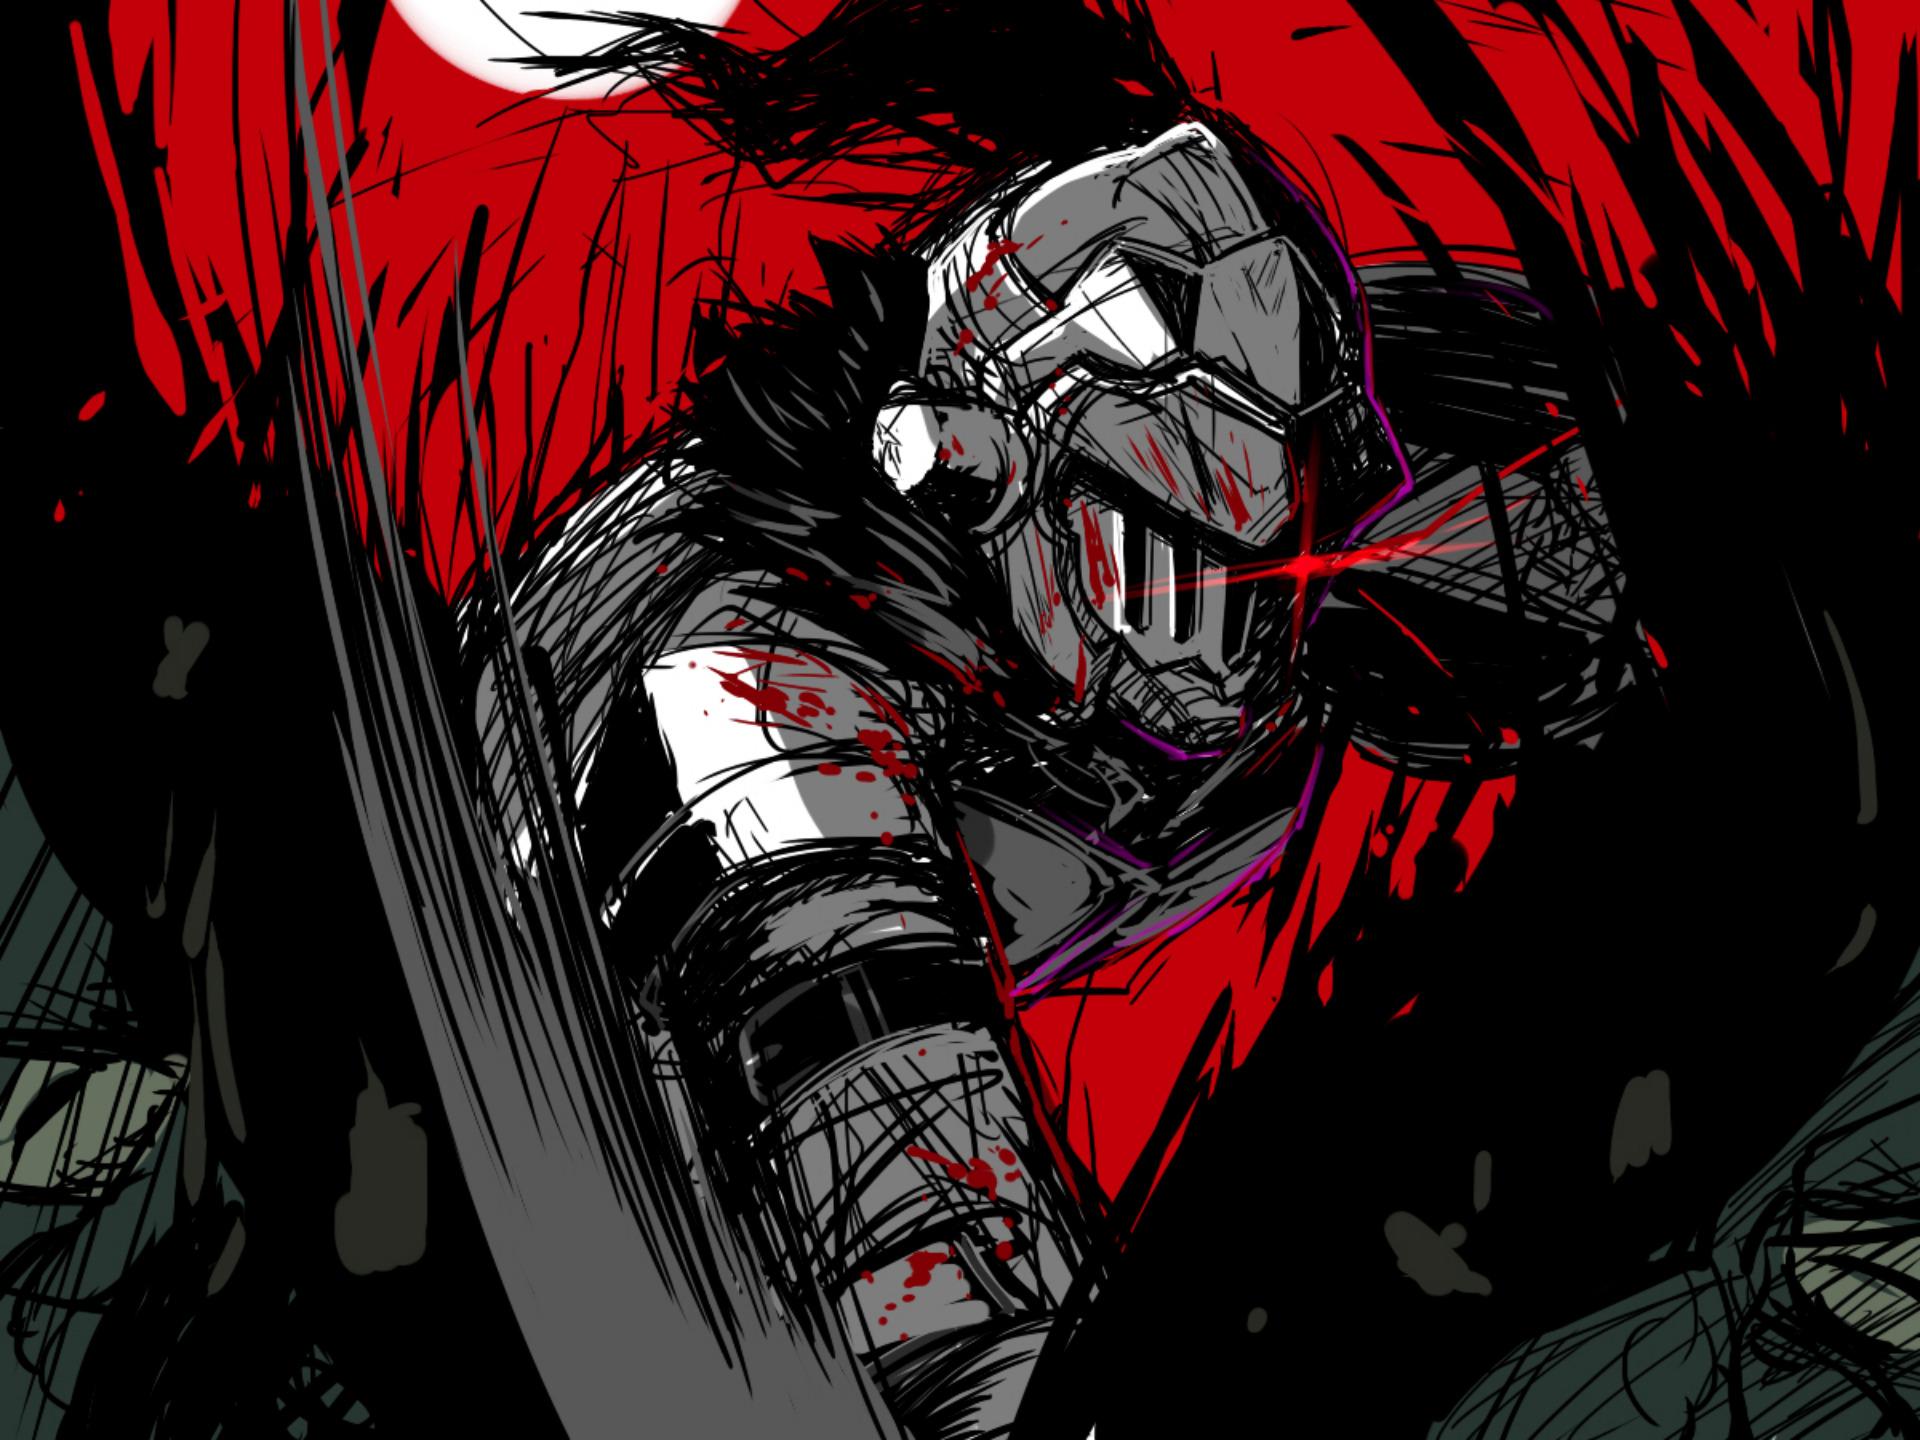 Goblin Slayer HD Wallpaper | Hintergrund | 1920x1440 | ID ...